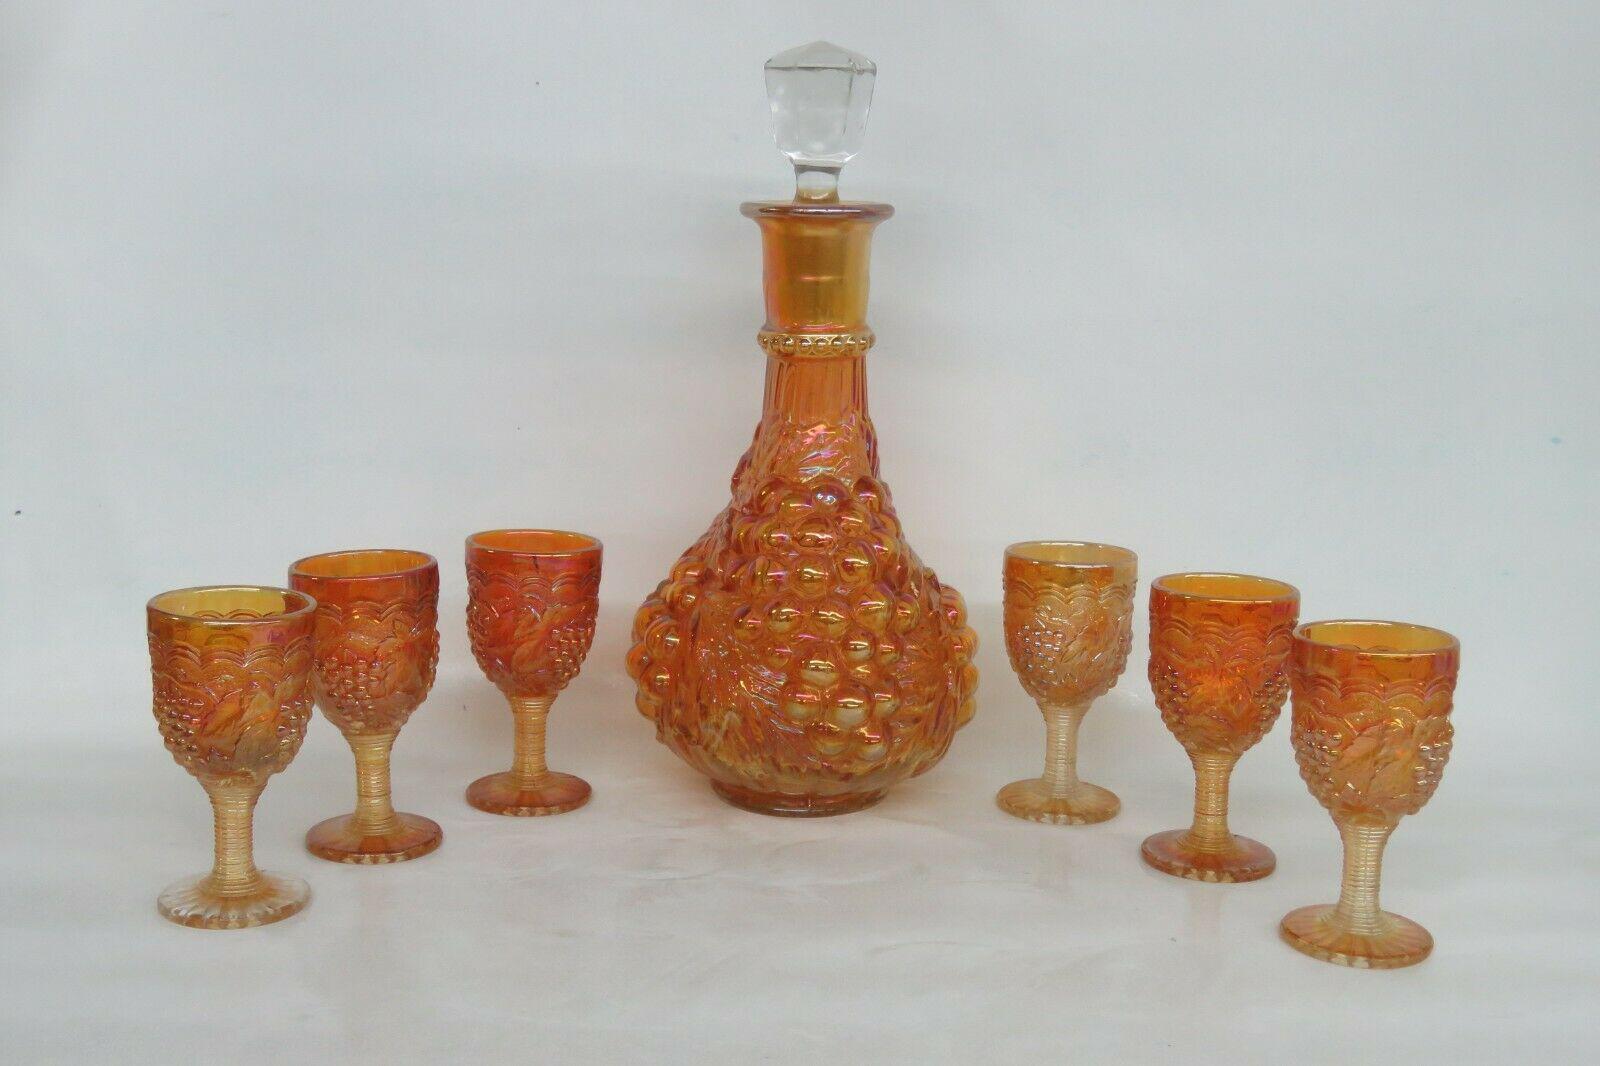 Marigold cordial set